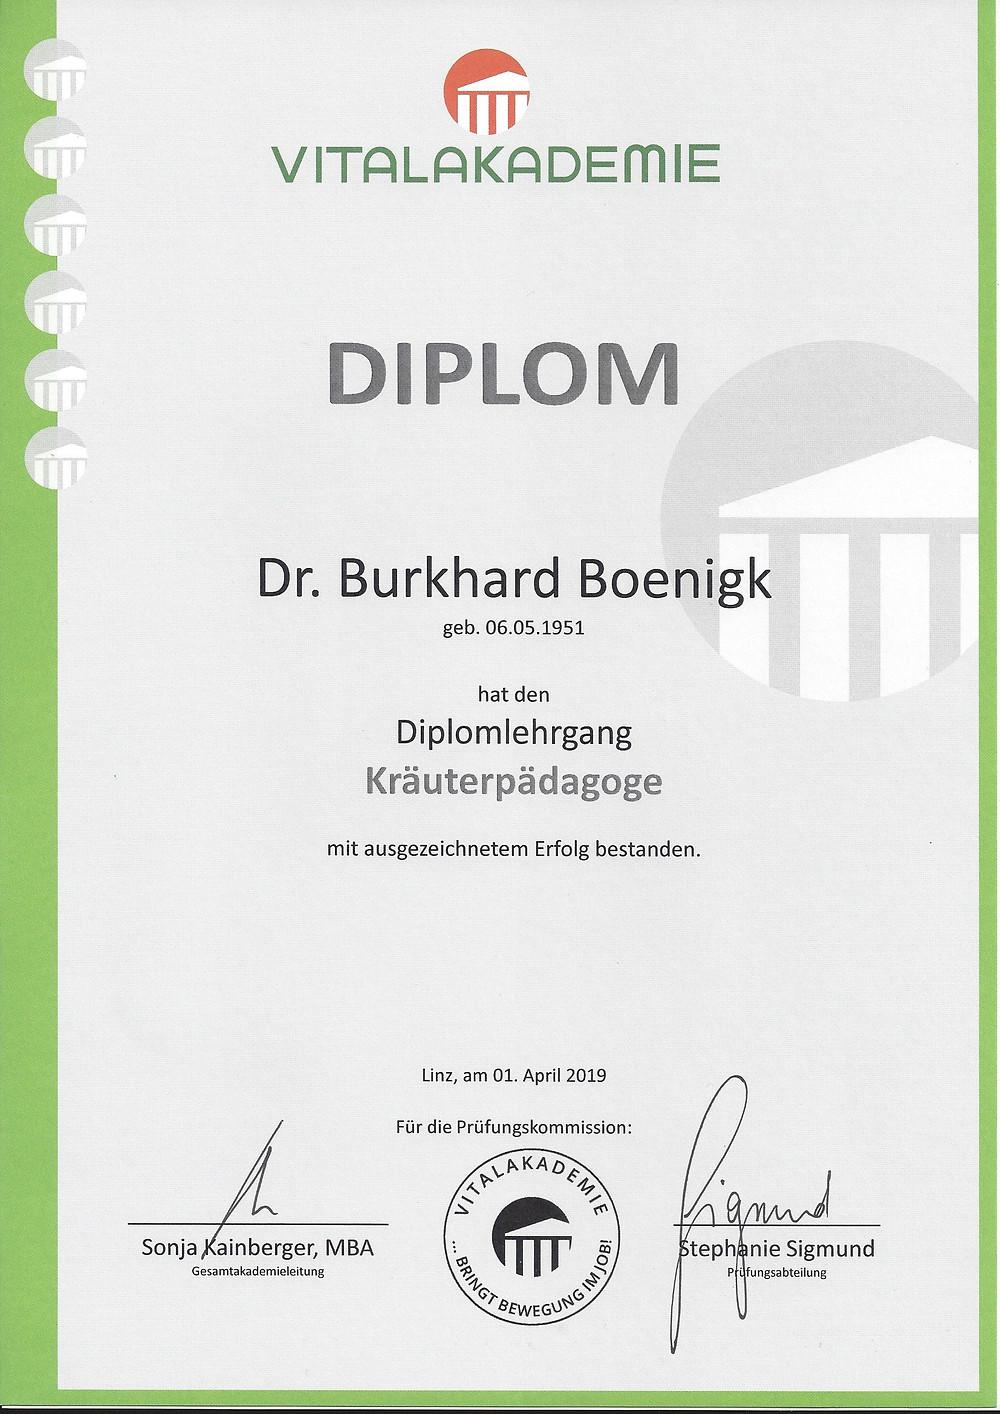 Laufinstinkt.de - Kräuterpädagogik - Dr. Burkhard Boenigk - Diplomurkunde